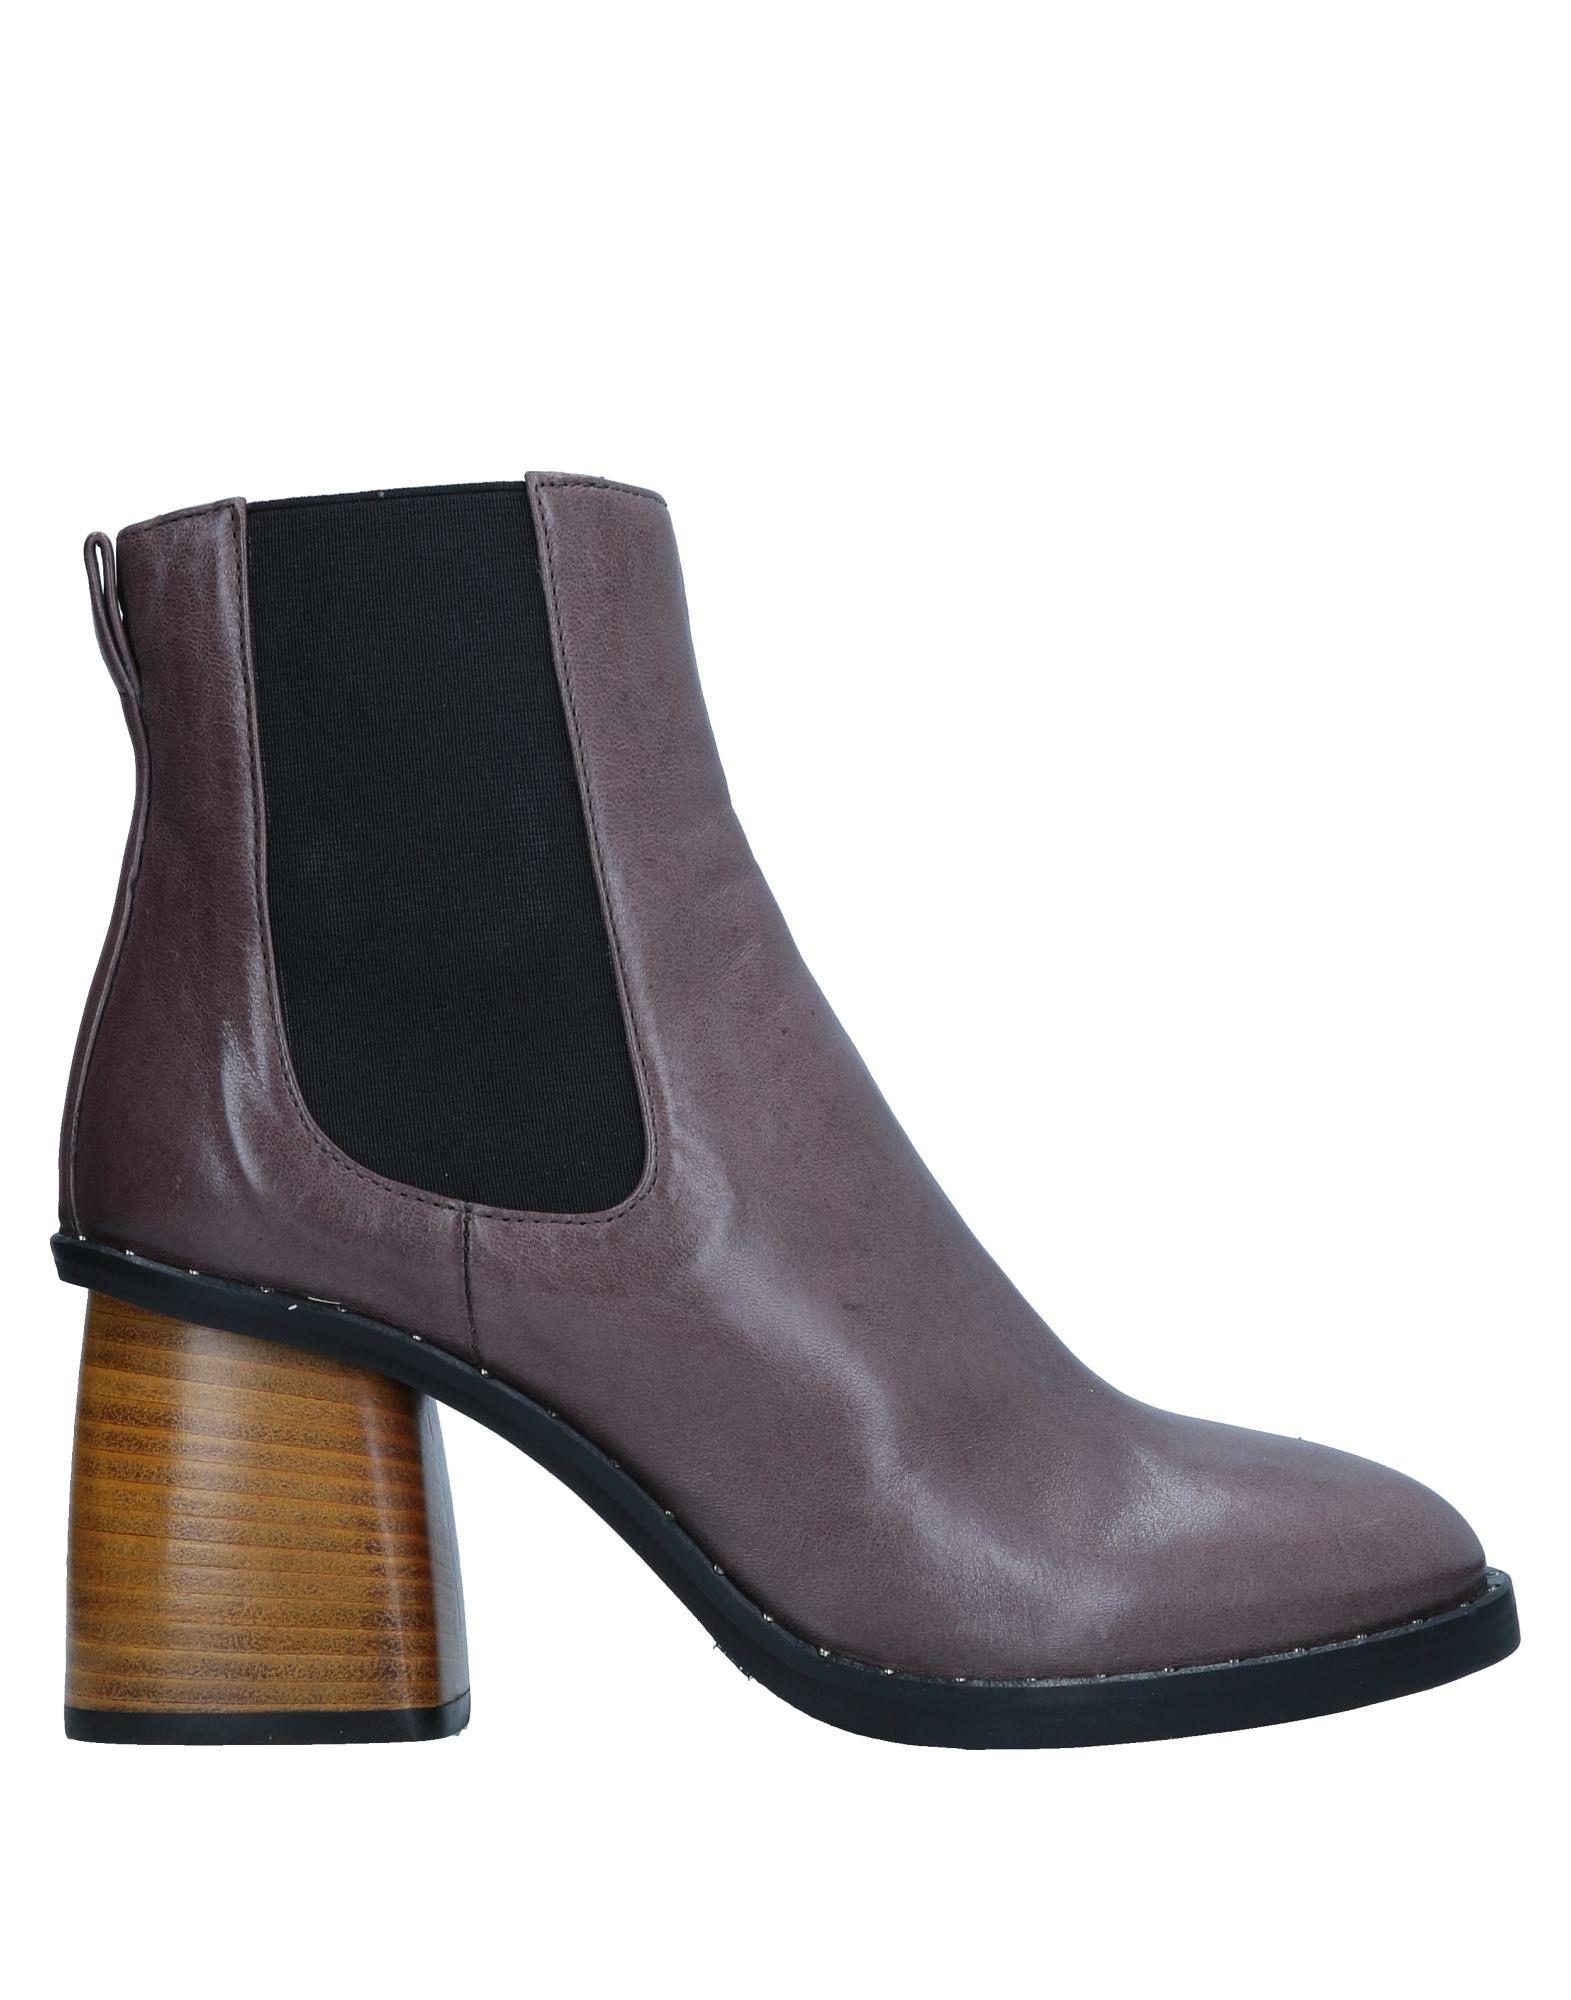 Gut um billige Schuhe zu tragenAndrea Morando 11525293JH Chelsea Boots Damen  11525293JH Morando 6acf54